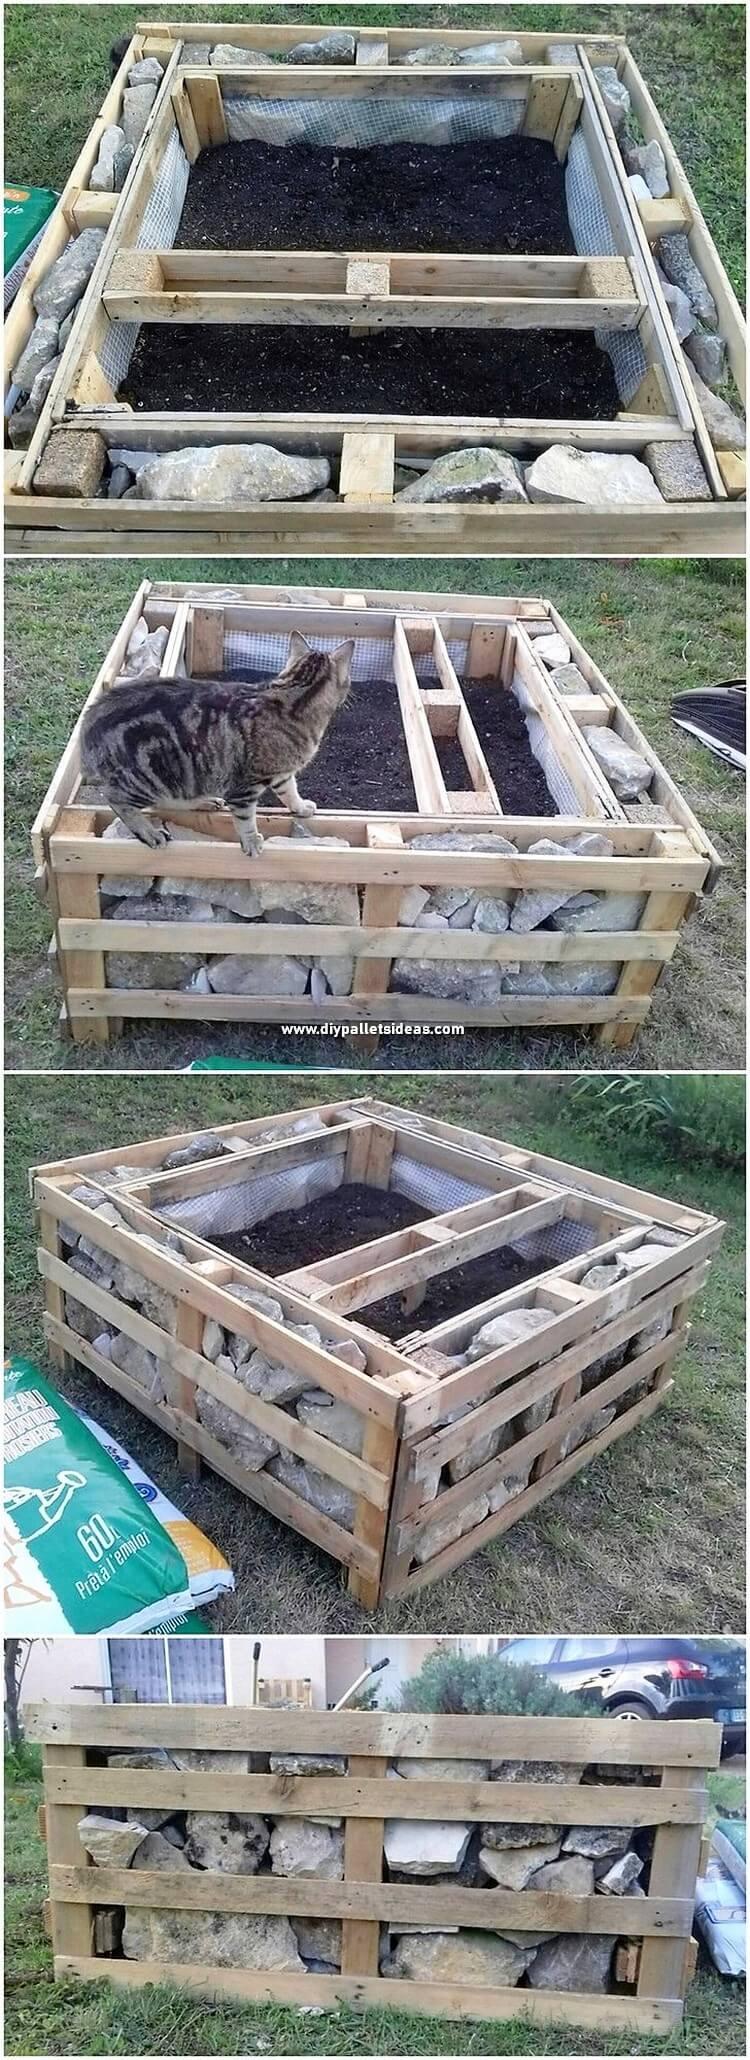 Pallet Raised Garden Bed or Planter